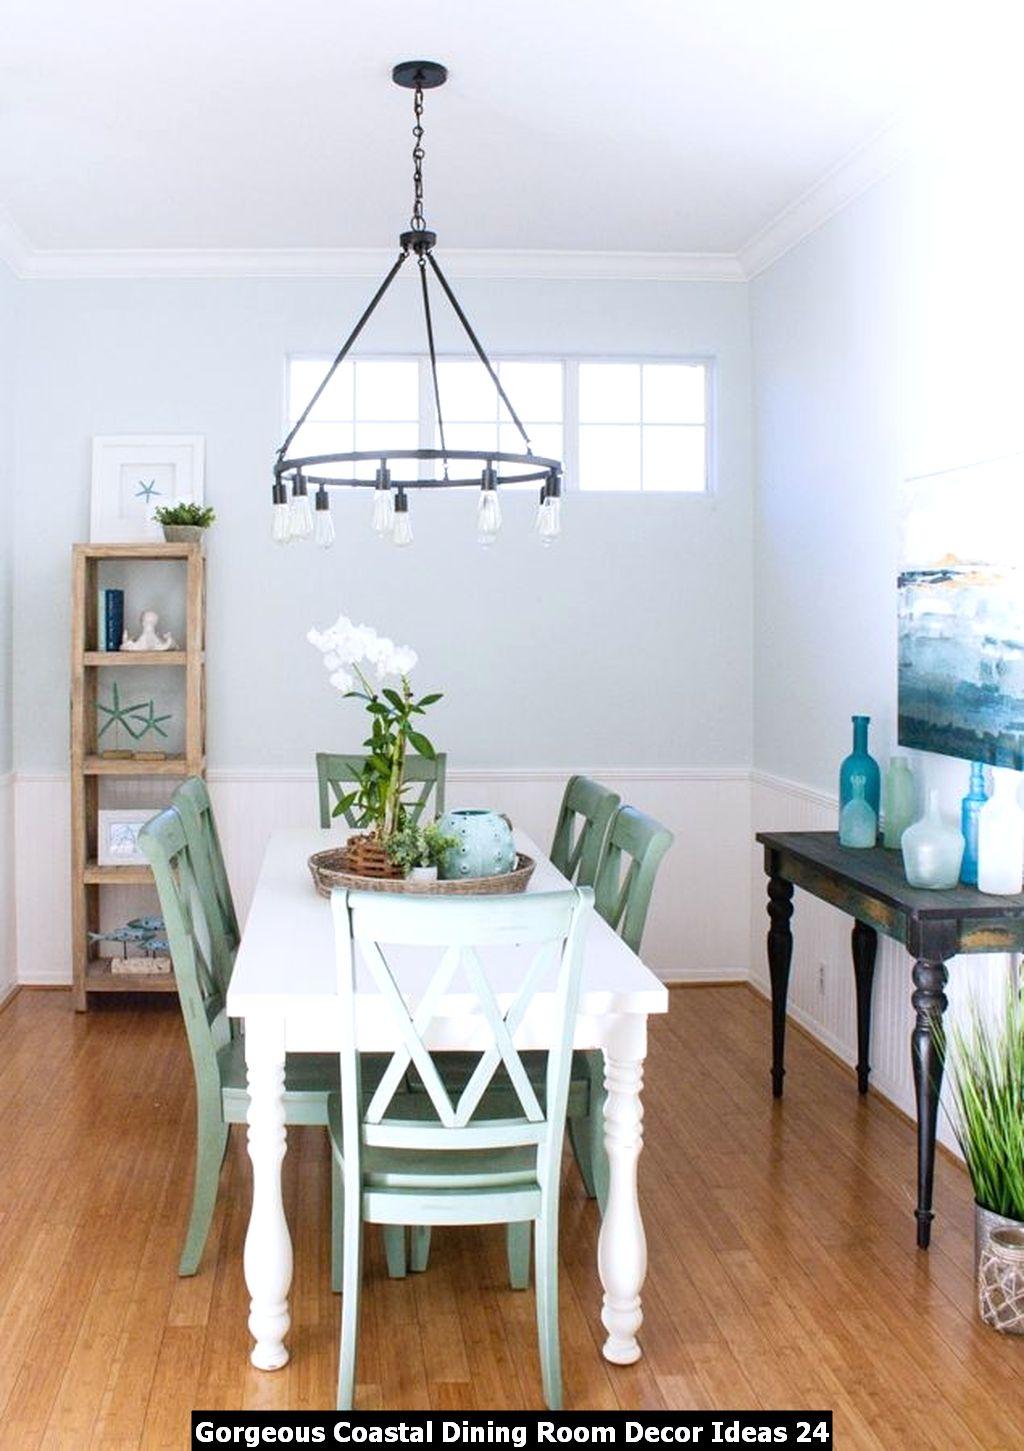 Gorgeous Coastal Dining Room Decor Ideas 24